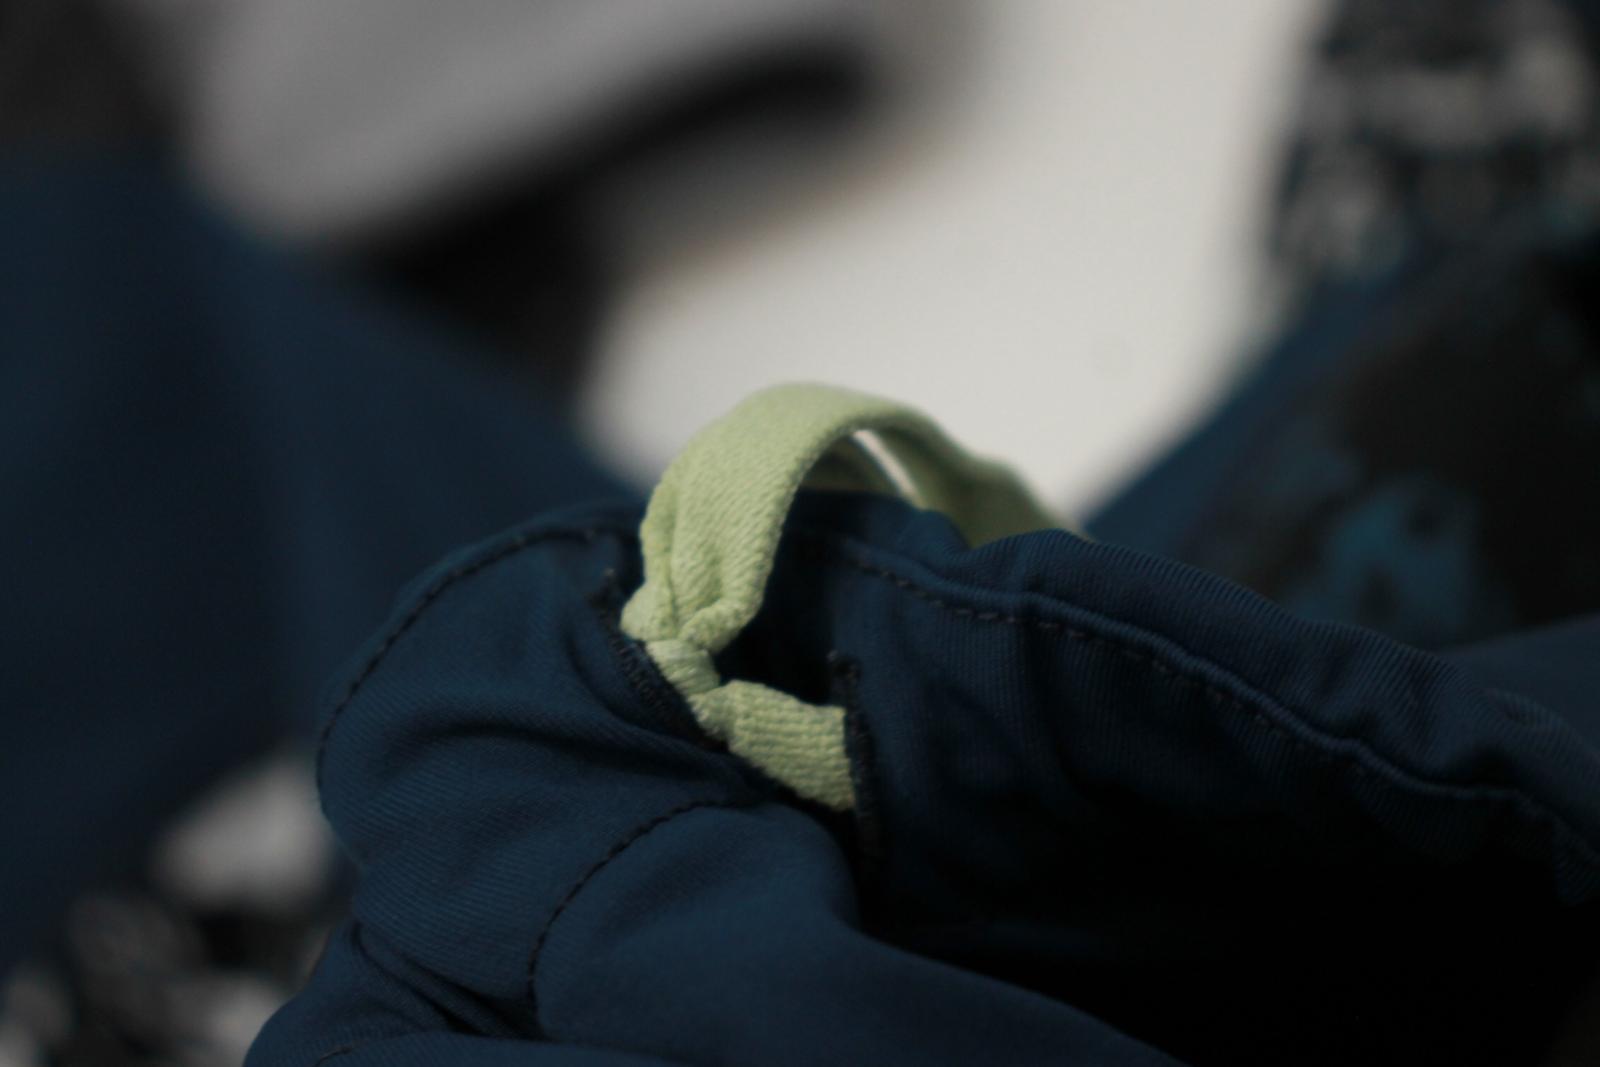 Sweaty-Betty-Damas-Azul-Oscuro-Impreso-Negro-Recortada-Leggings-Talla-S-W26-L18 miniatura 9